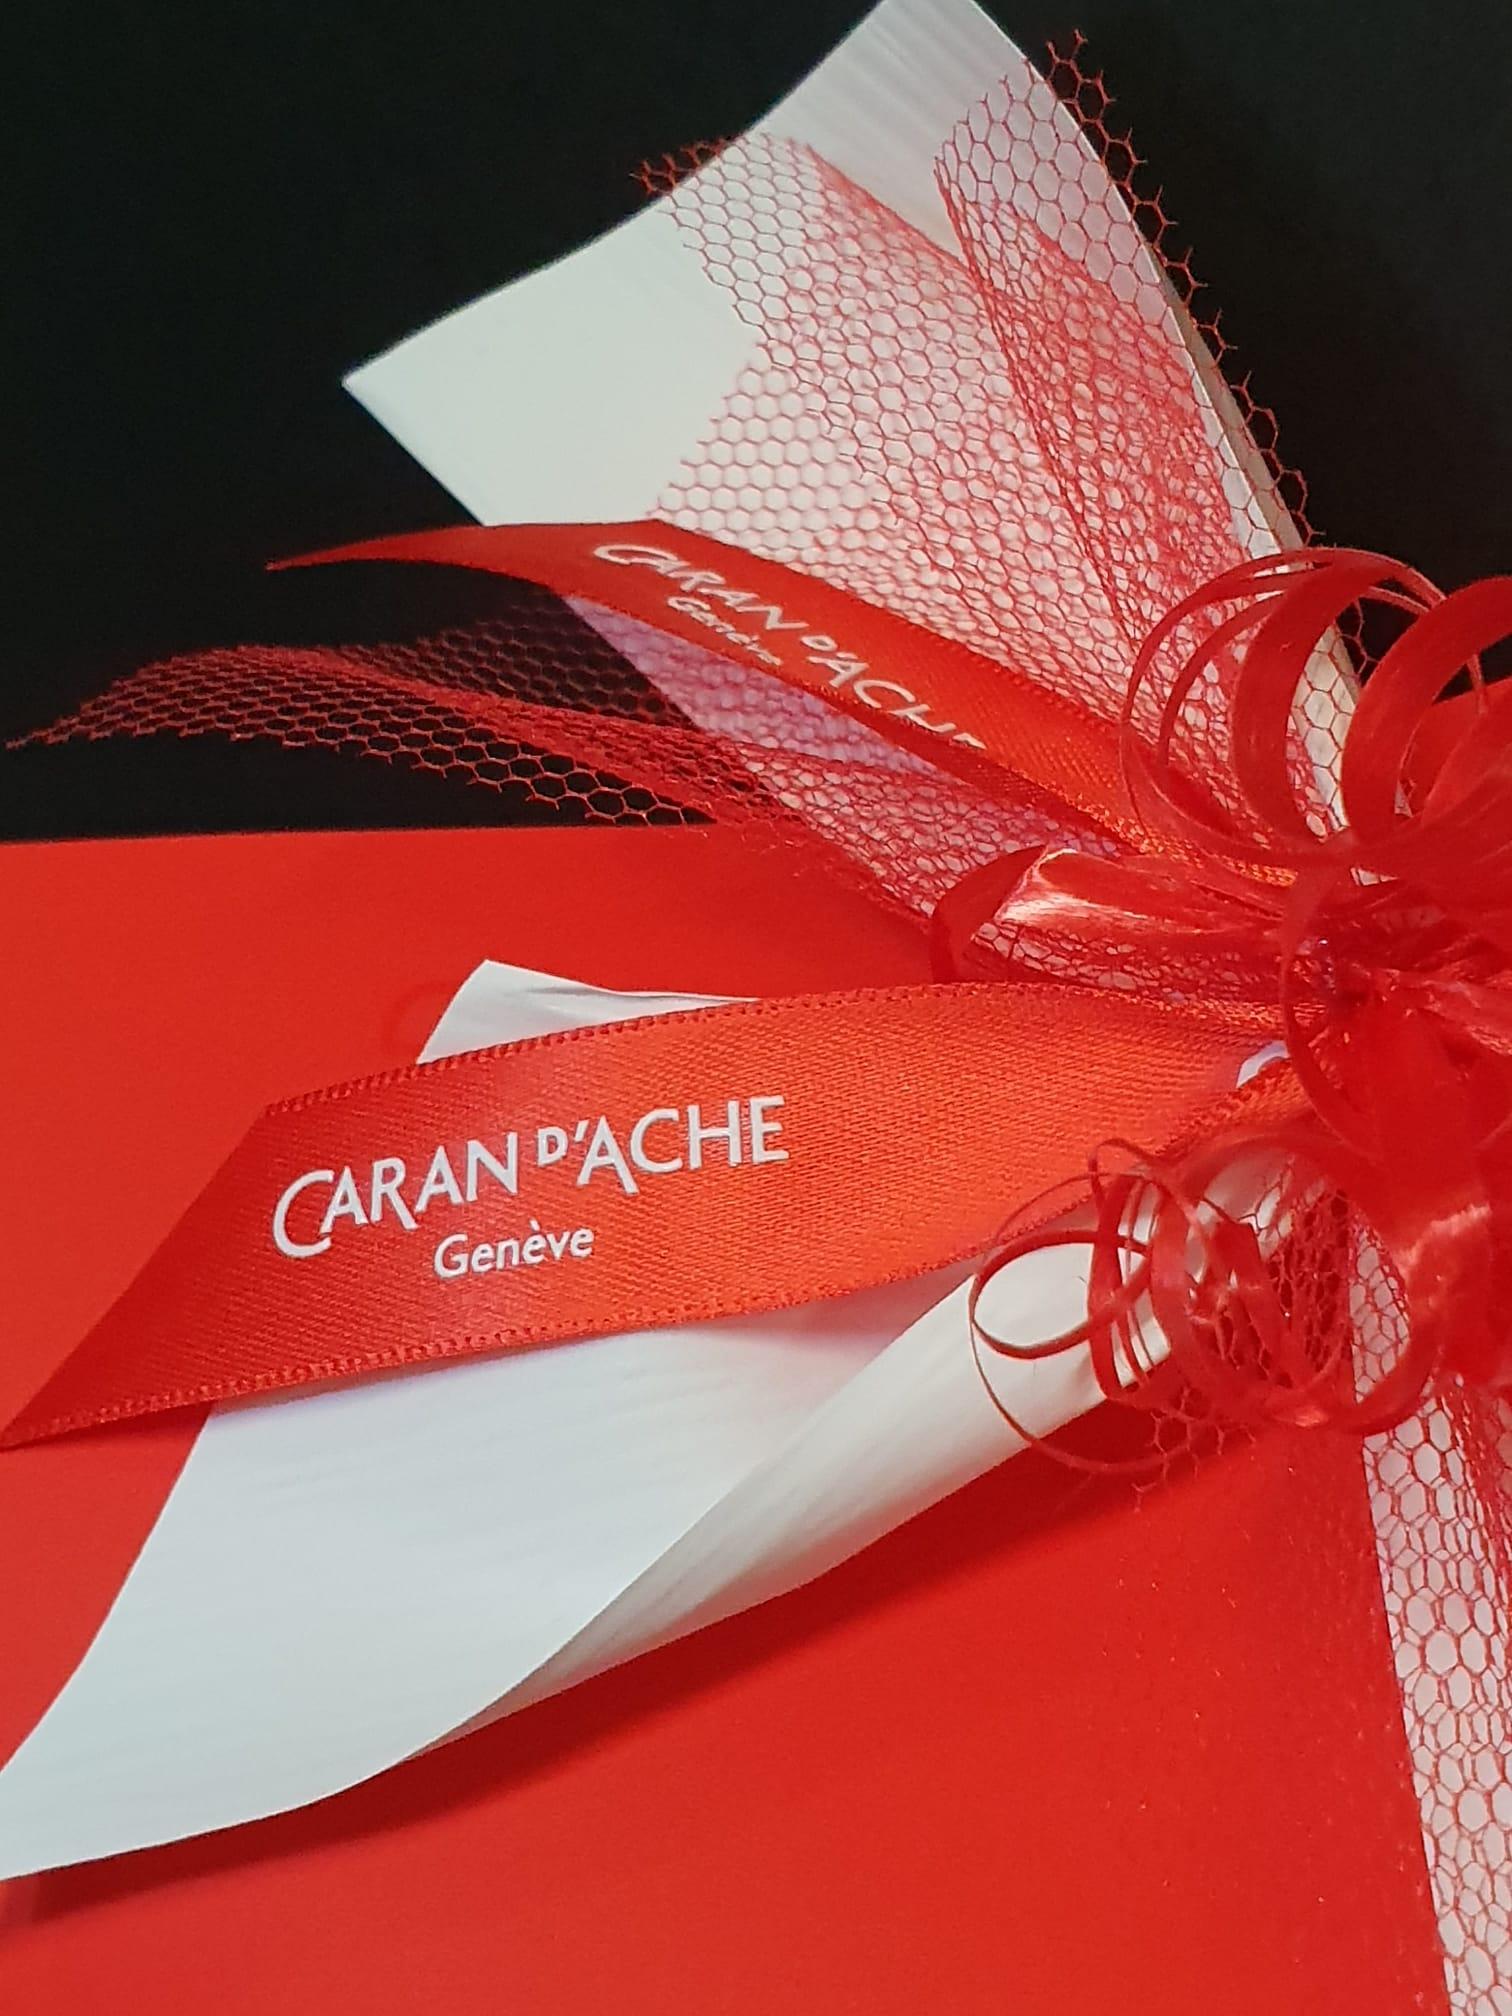 Caran d'Ache Geschenk-Verpackung